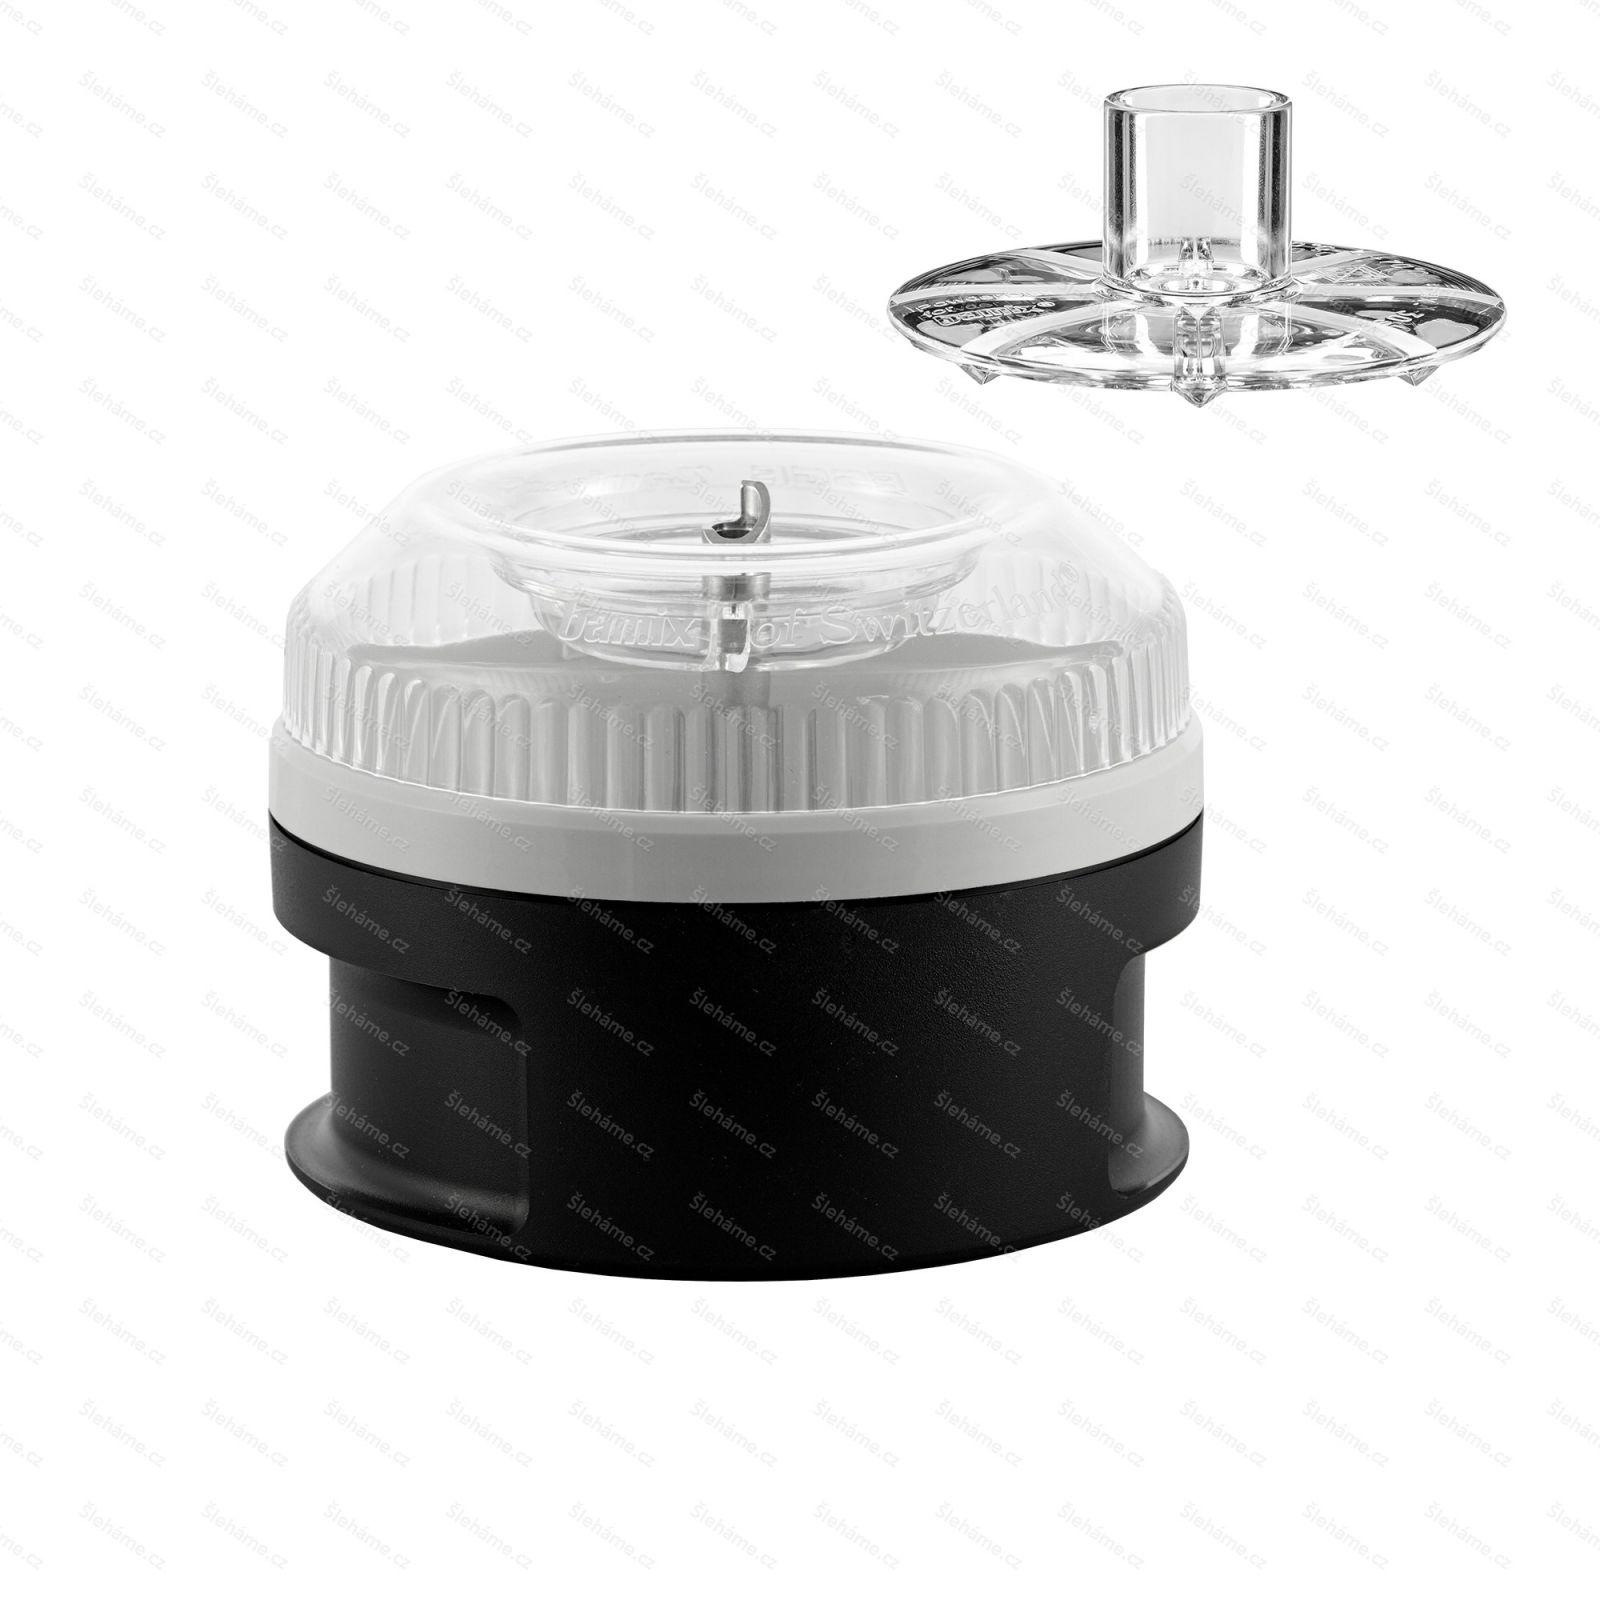 Procesor 200 ml Bamix se stlačovadlem, černý